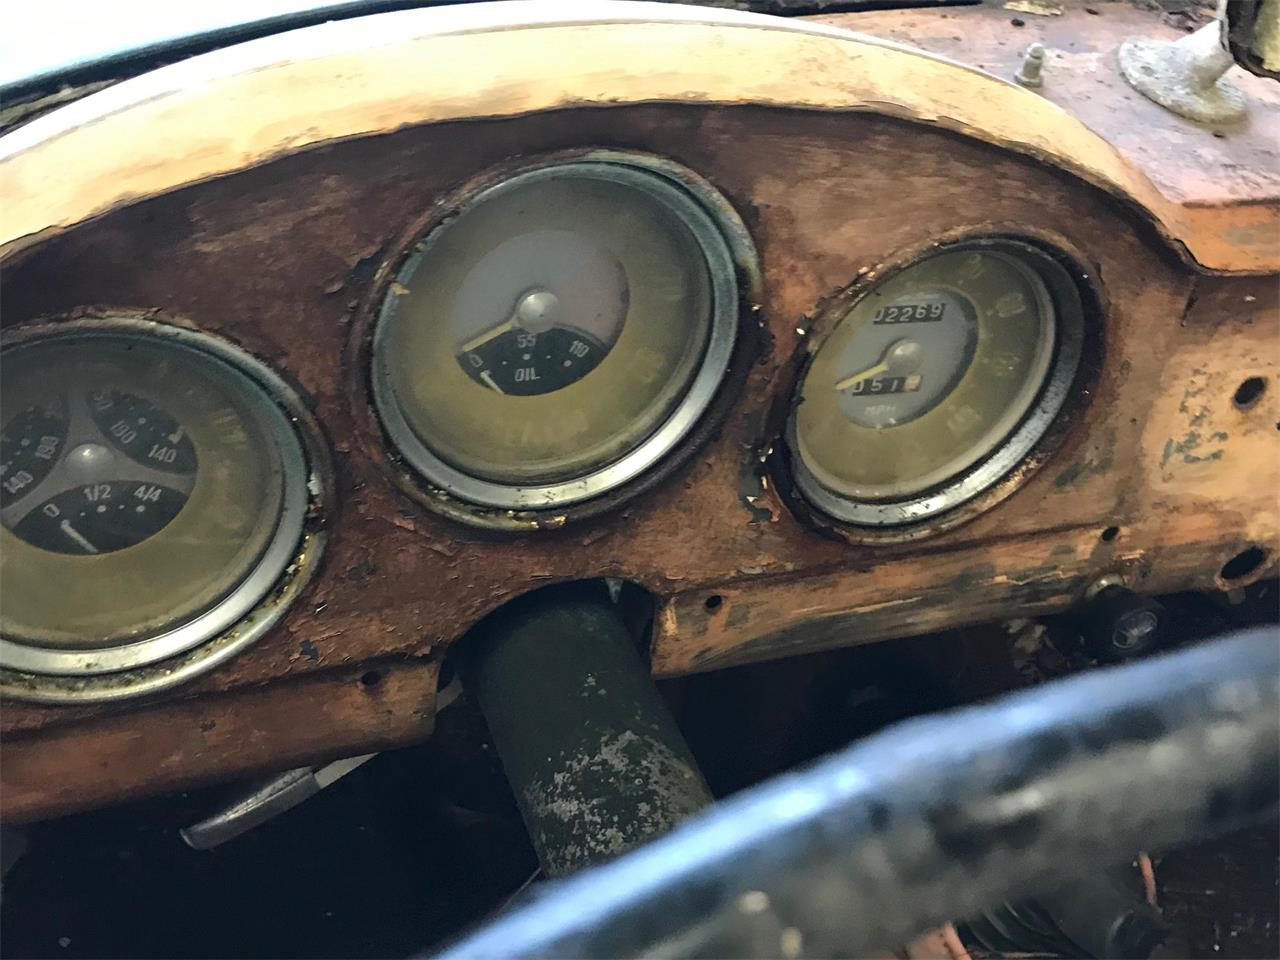 Large Picture of '63 Alfa Romeo Giulietta Spider located in Ohio - $14,950.00 - PFS7